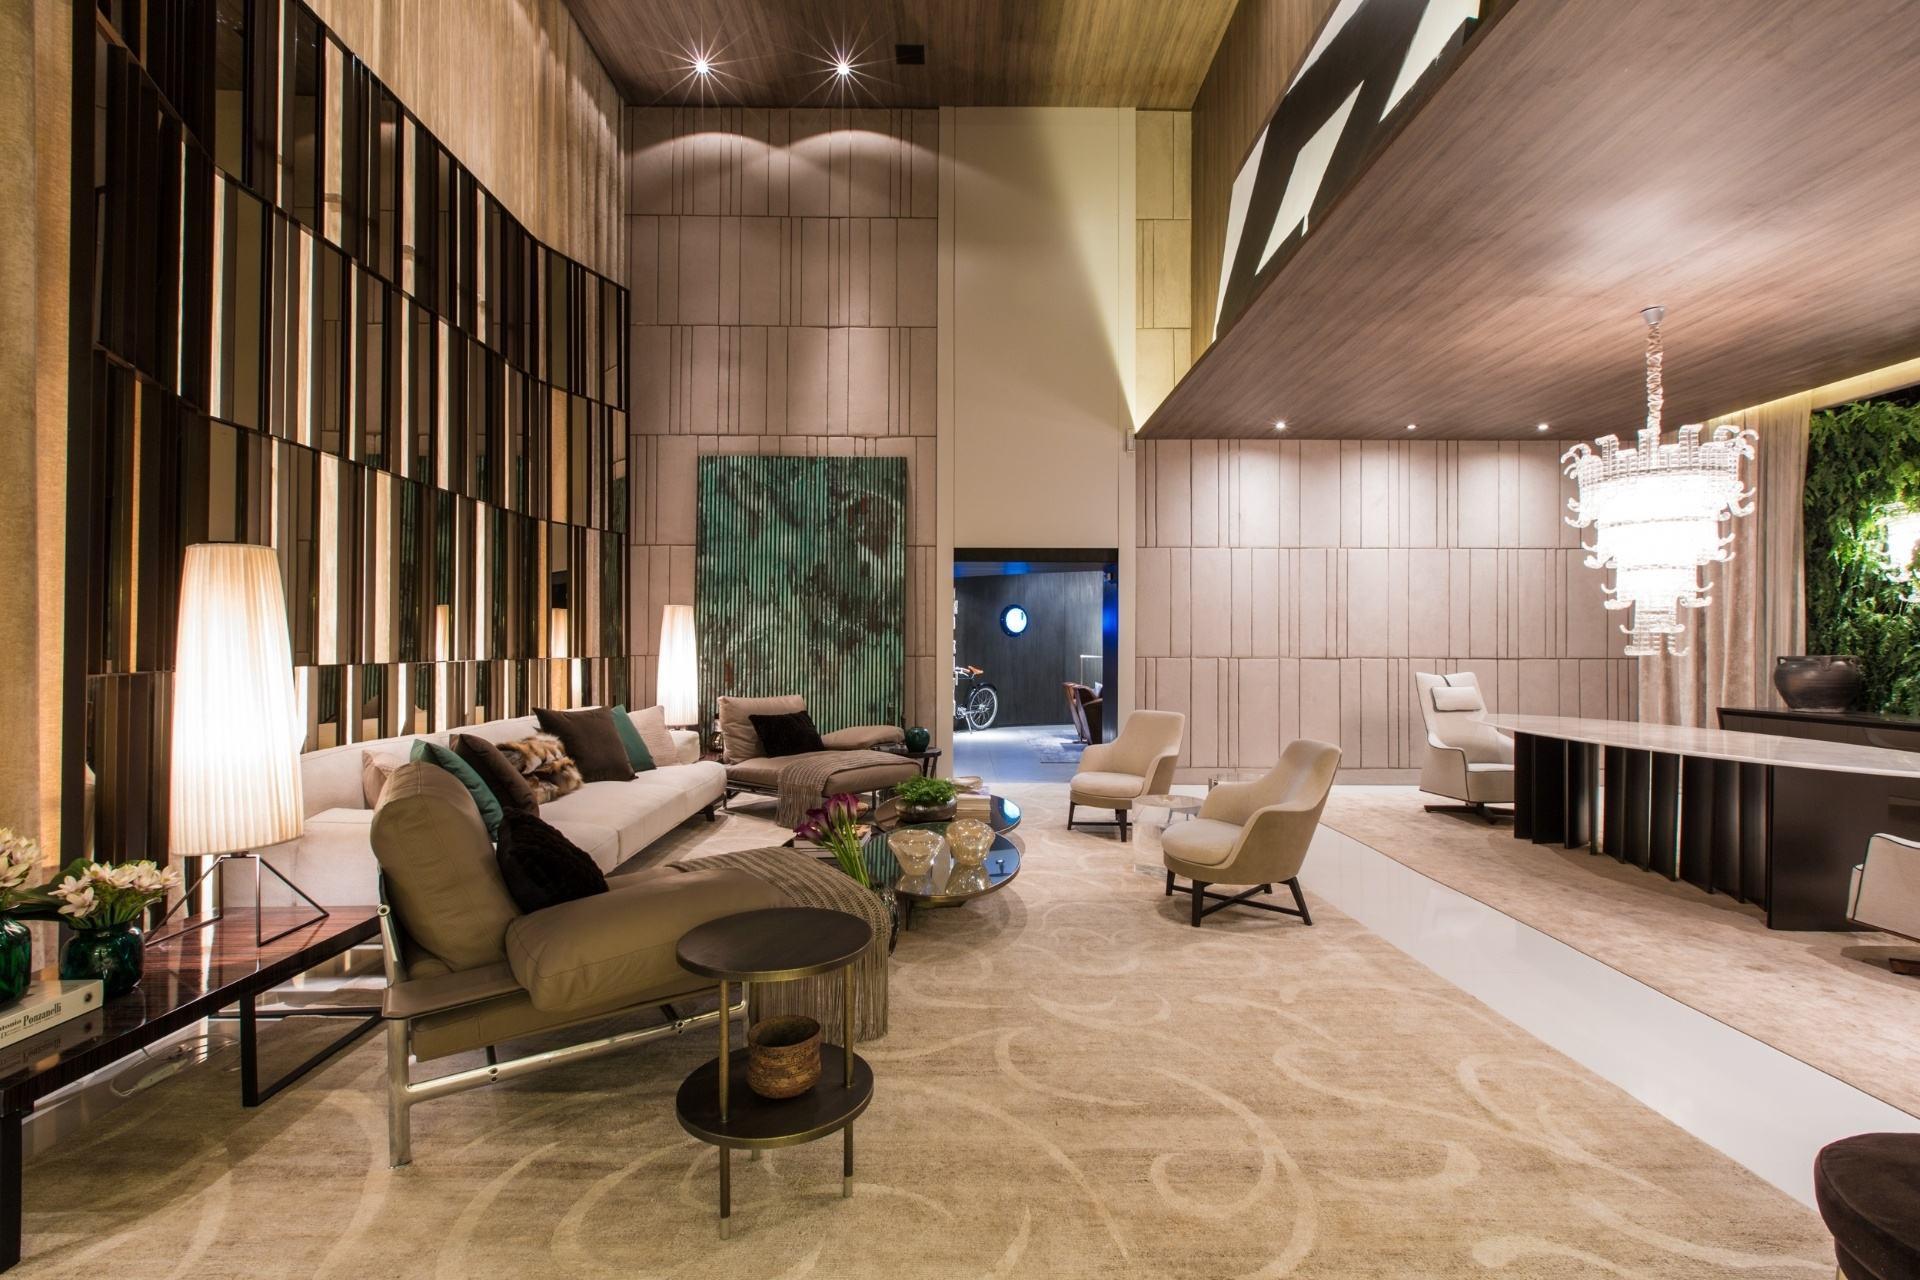 Salas De Luxo 60 Ideias E Fotos Inspiradoras  -> Casa Sala De Tv Sala De Jantar A Fazenda